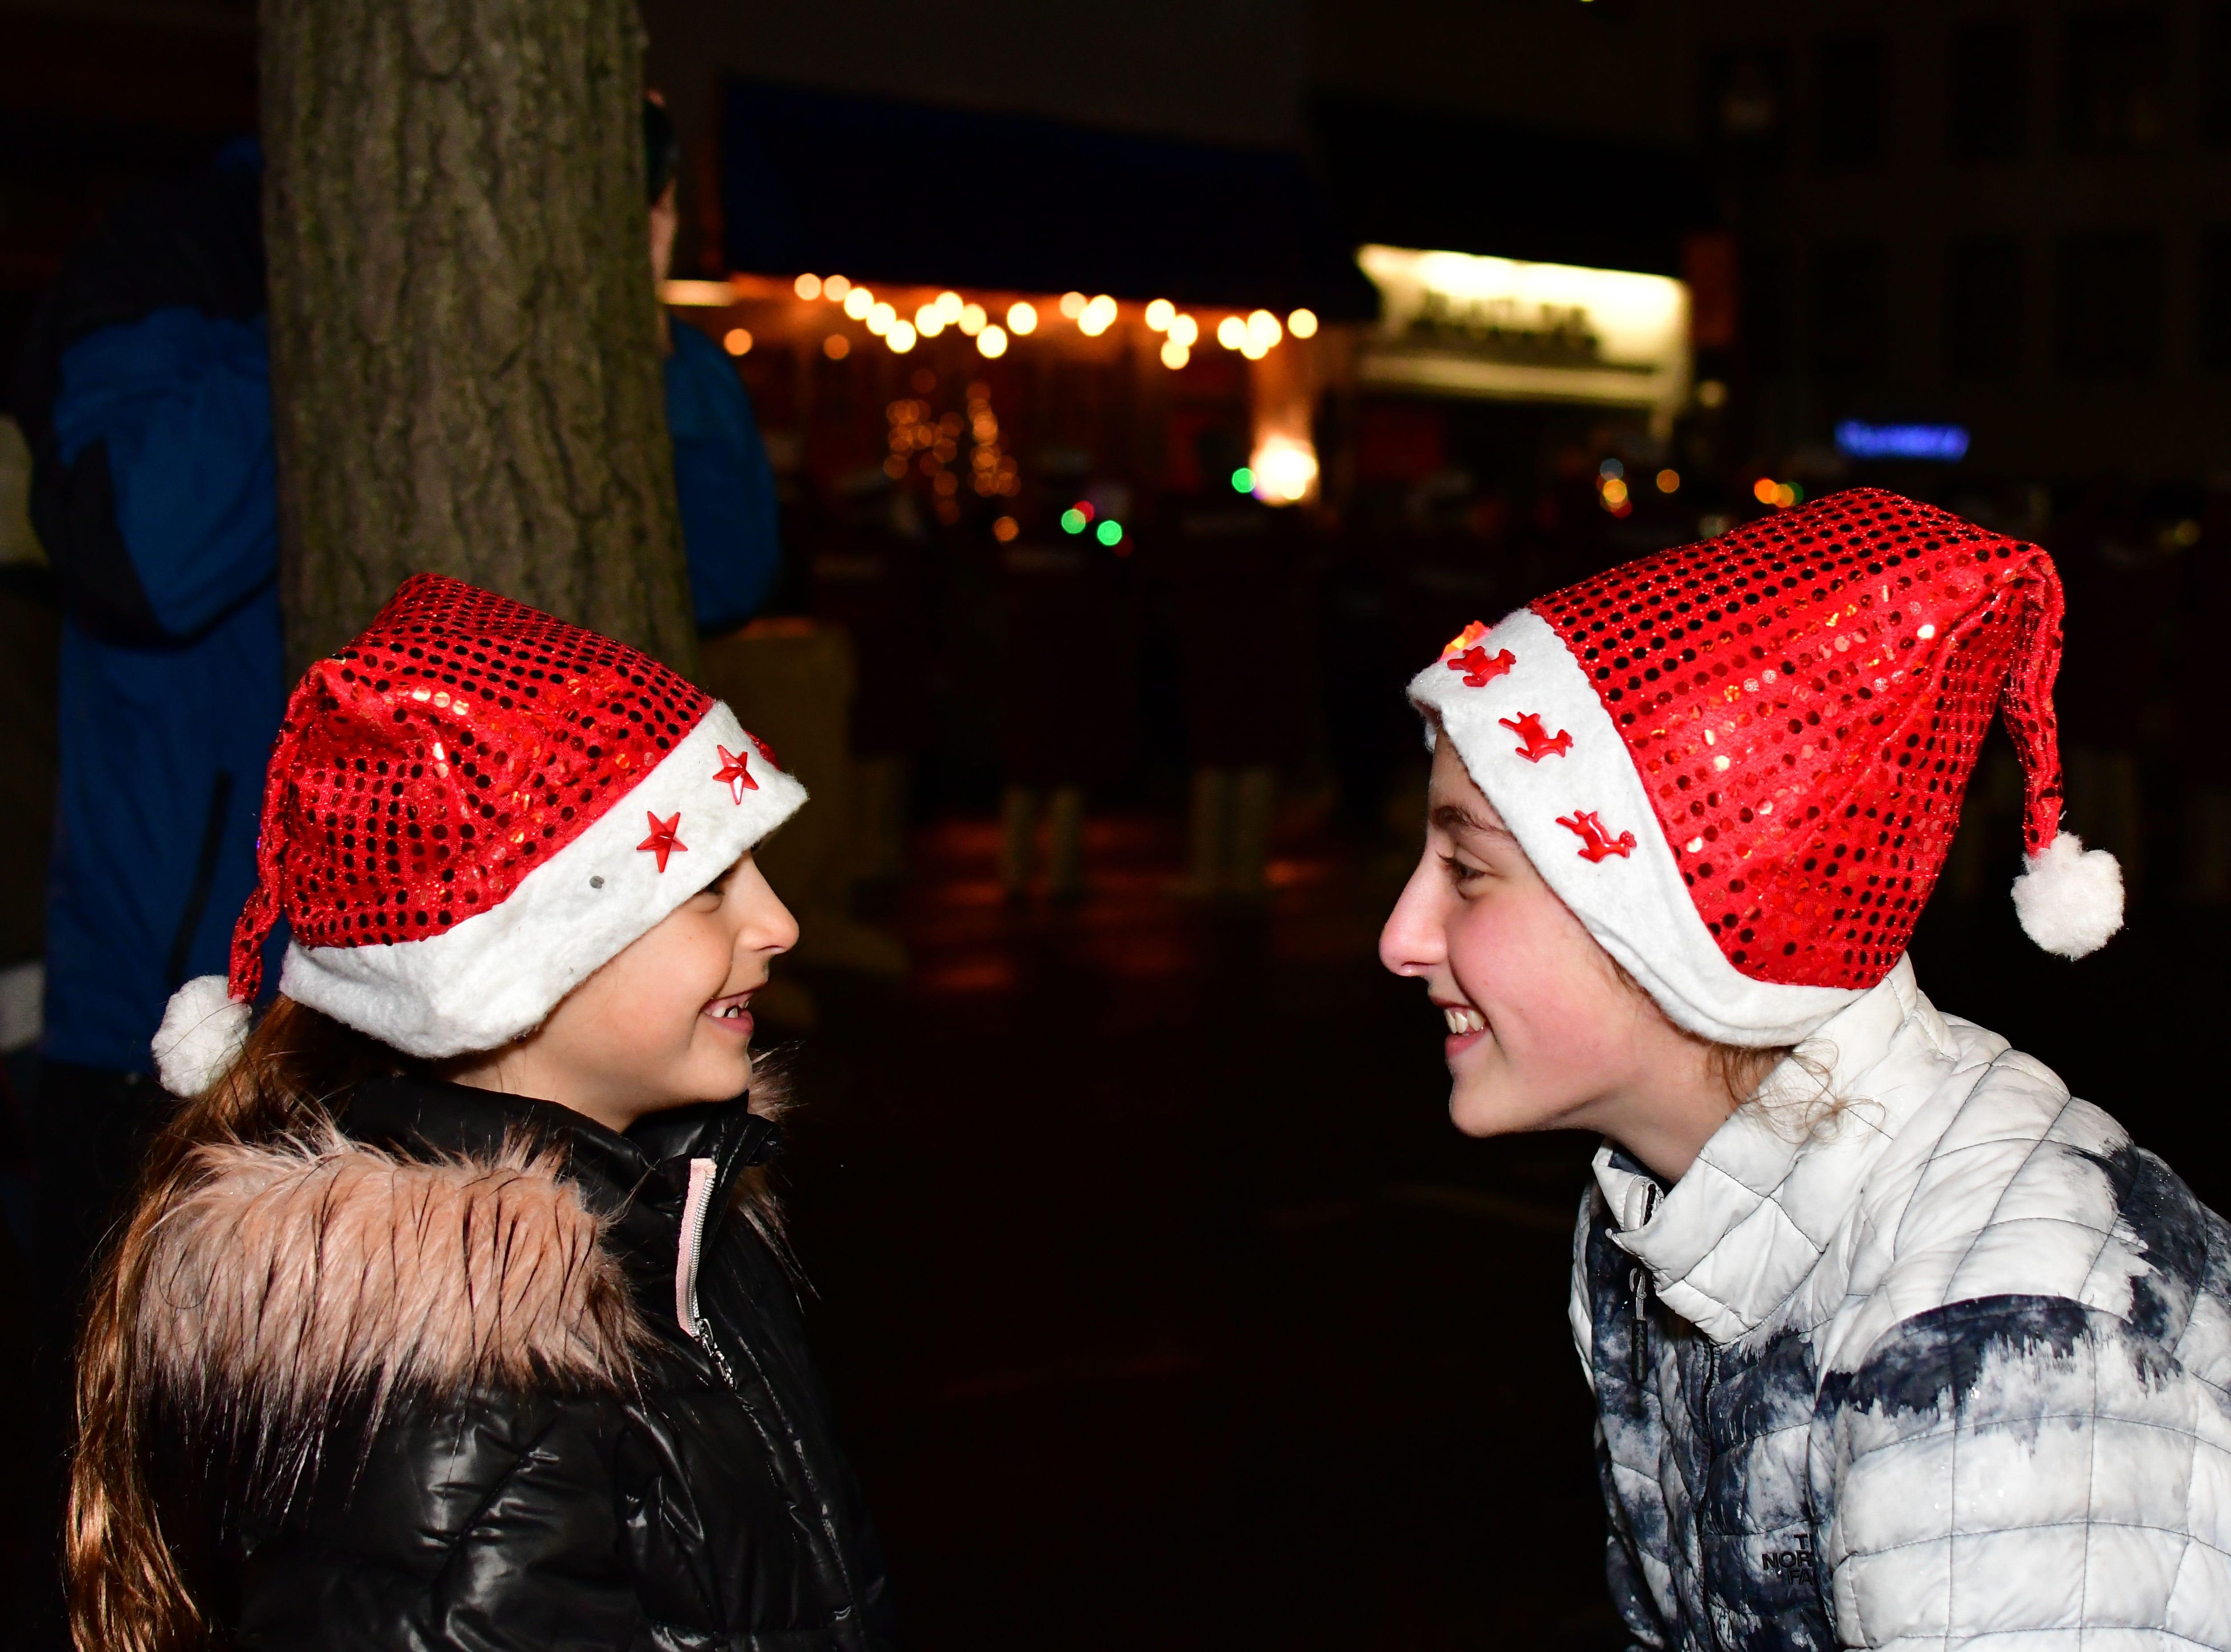 Gabriella and Giuliana Servedio. Holiday festivities along East Ridgewood Avenue in Ridgewood on Nov. 30.